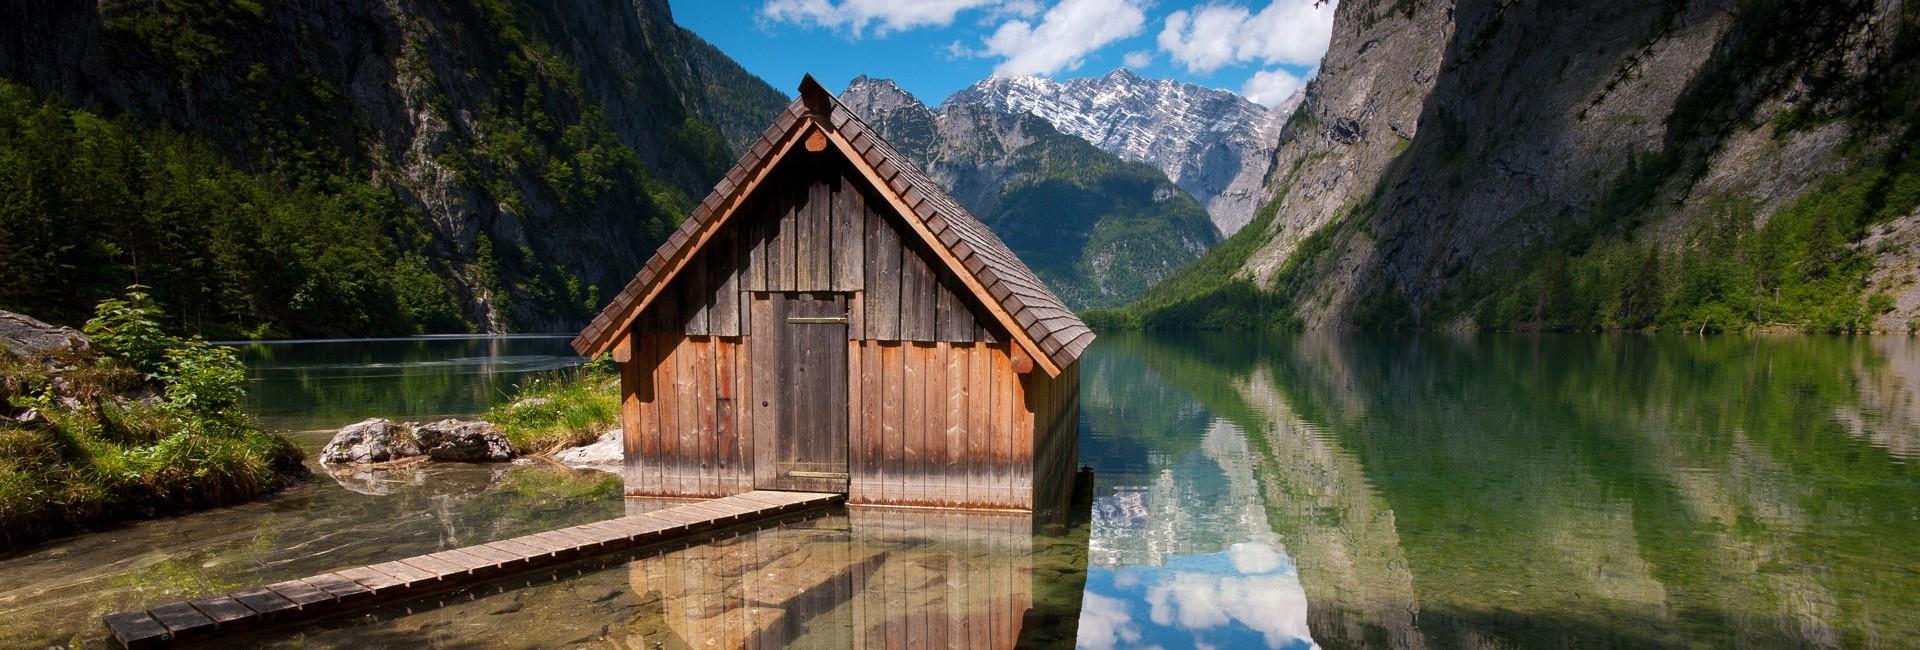 Lago-montana_1920x650